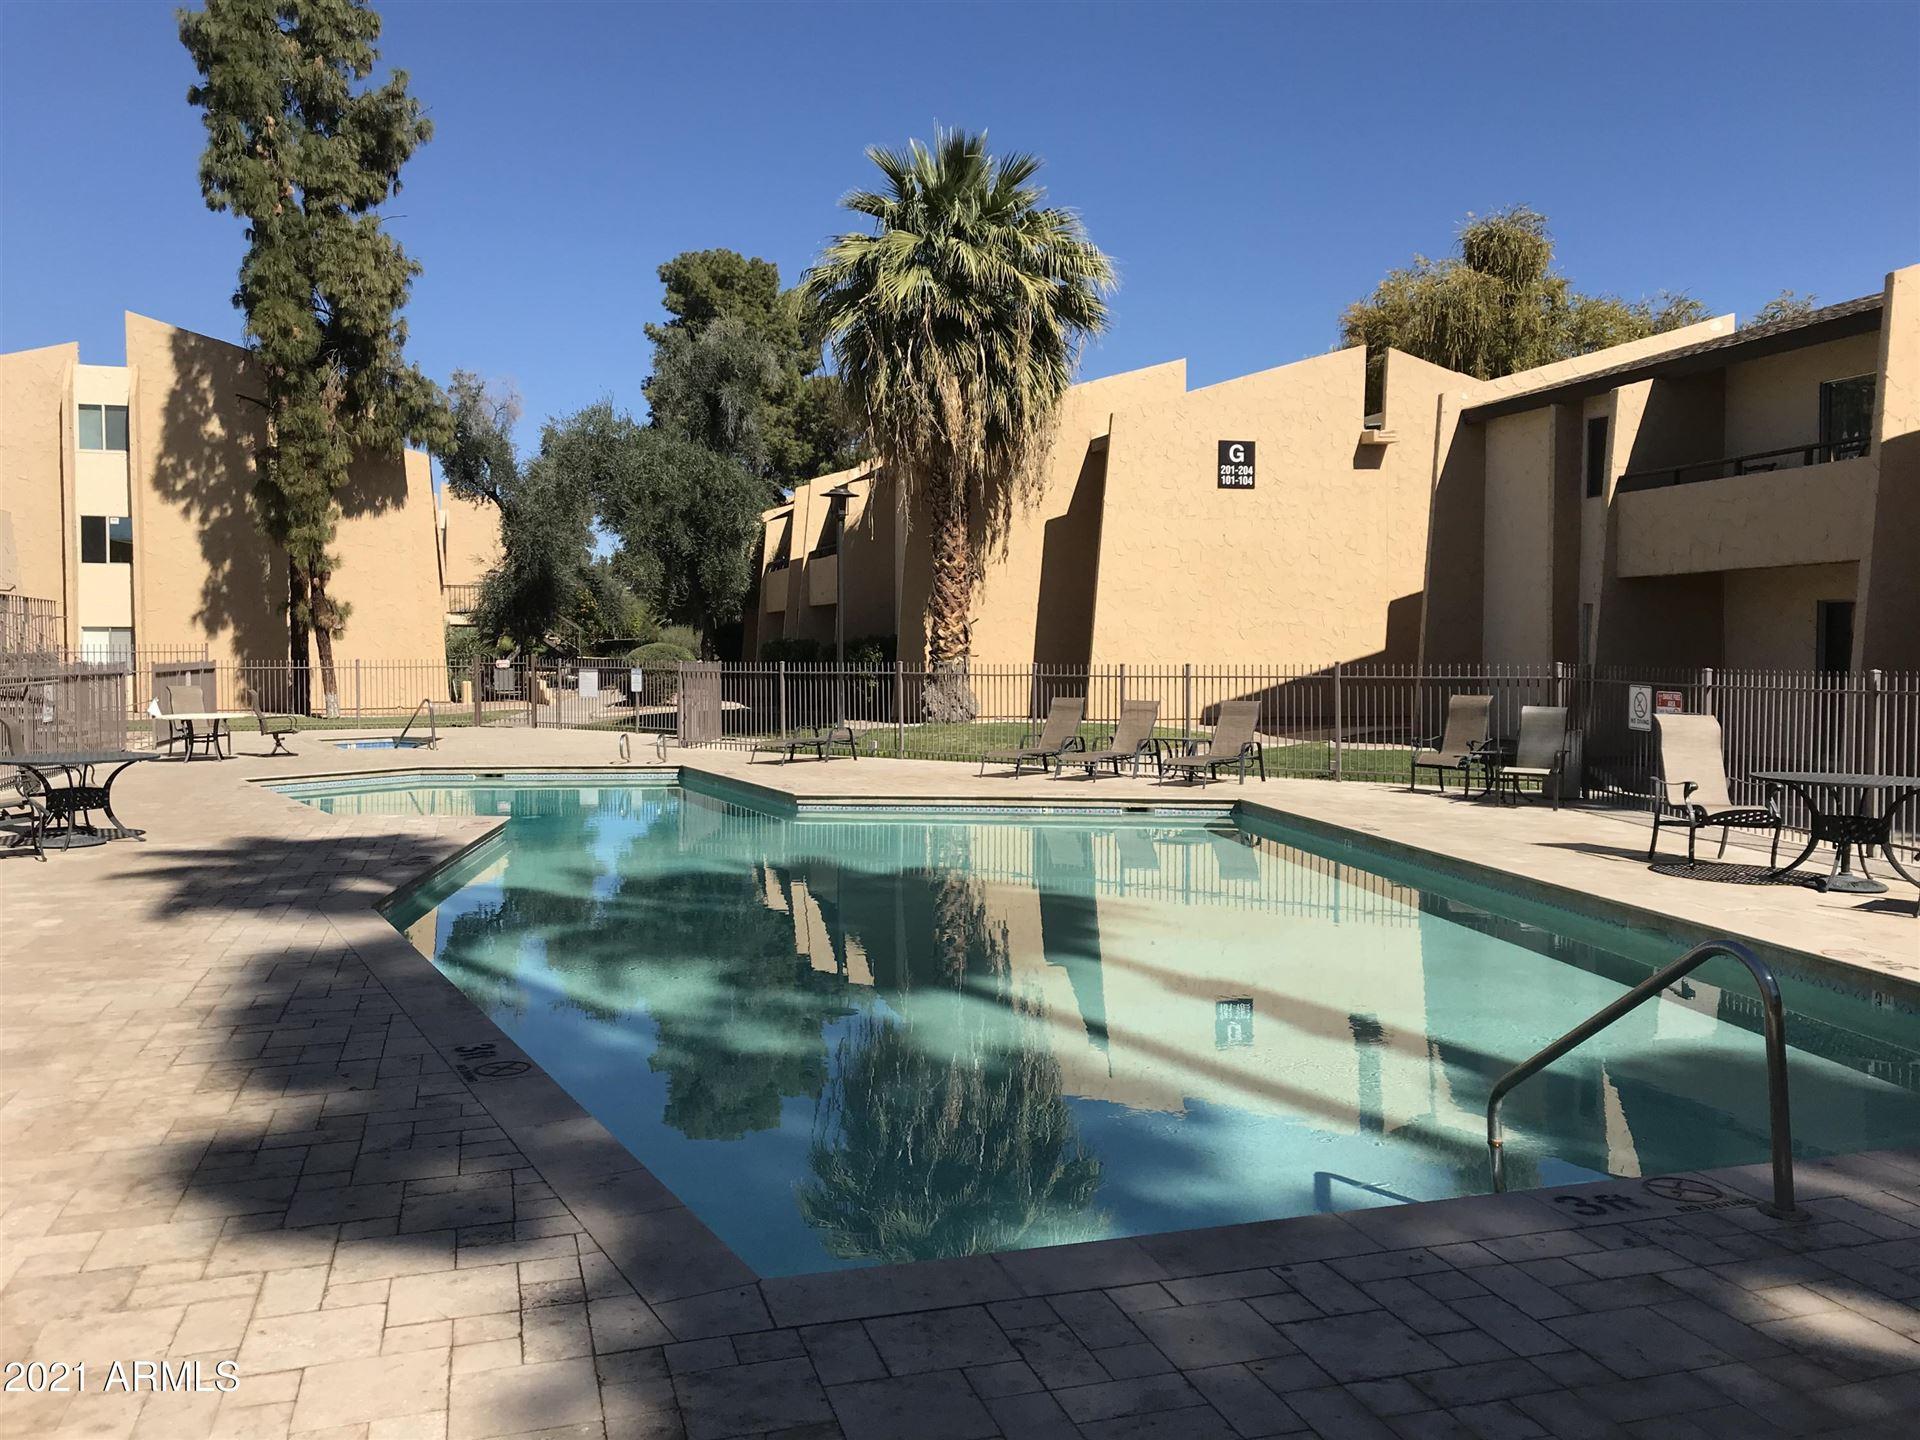 8055 E THOMAS Road #G103, Scottsdale, AZ 85251 - MLS#: 6173208